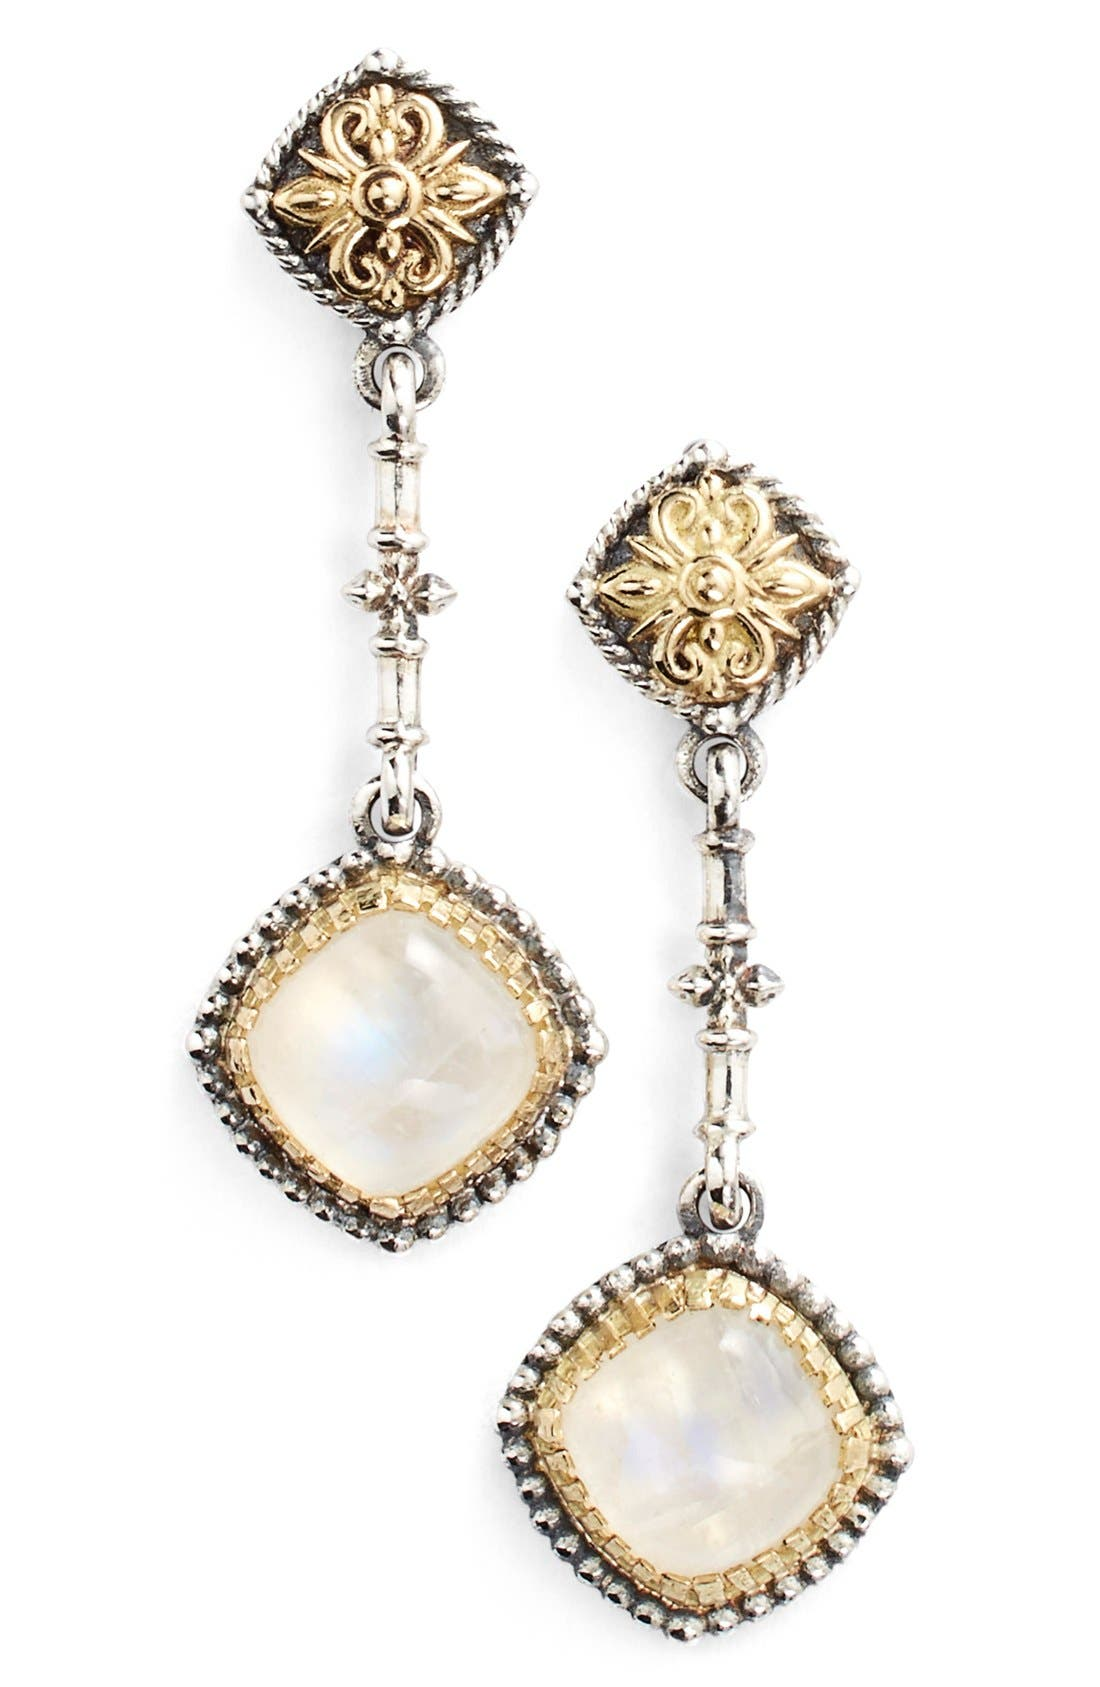 Main Image - Konstantino'Erato' Square Stone Drop Earrings